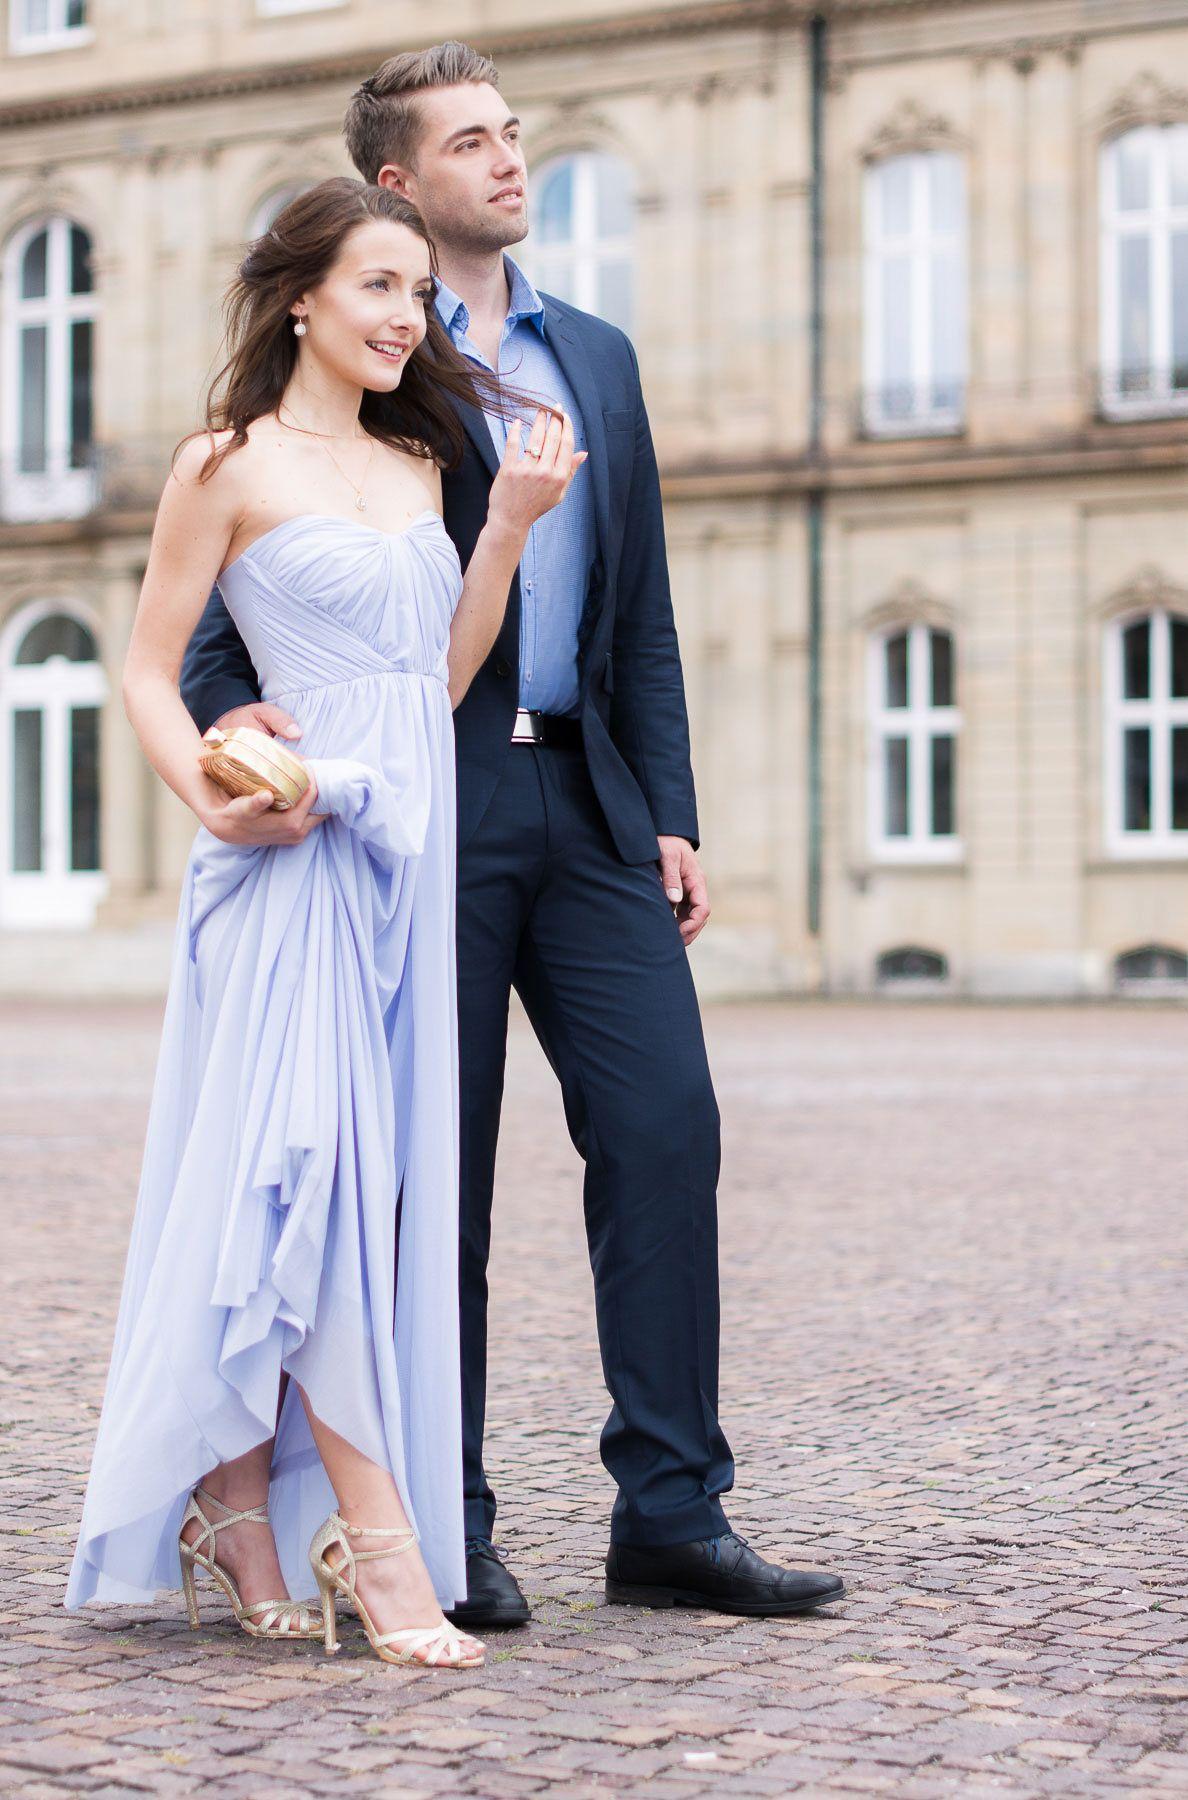 8b77127df39 Wedding guest  amp  graduation outfit ideas. Blue off-shoulder maxi dress  by Asos